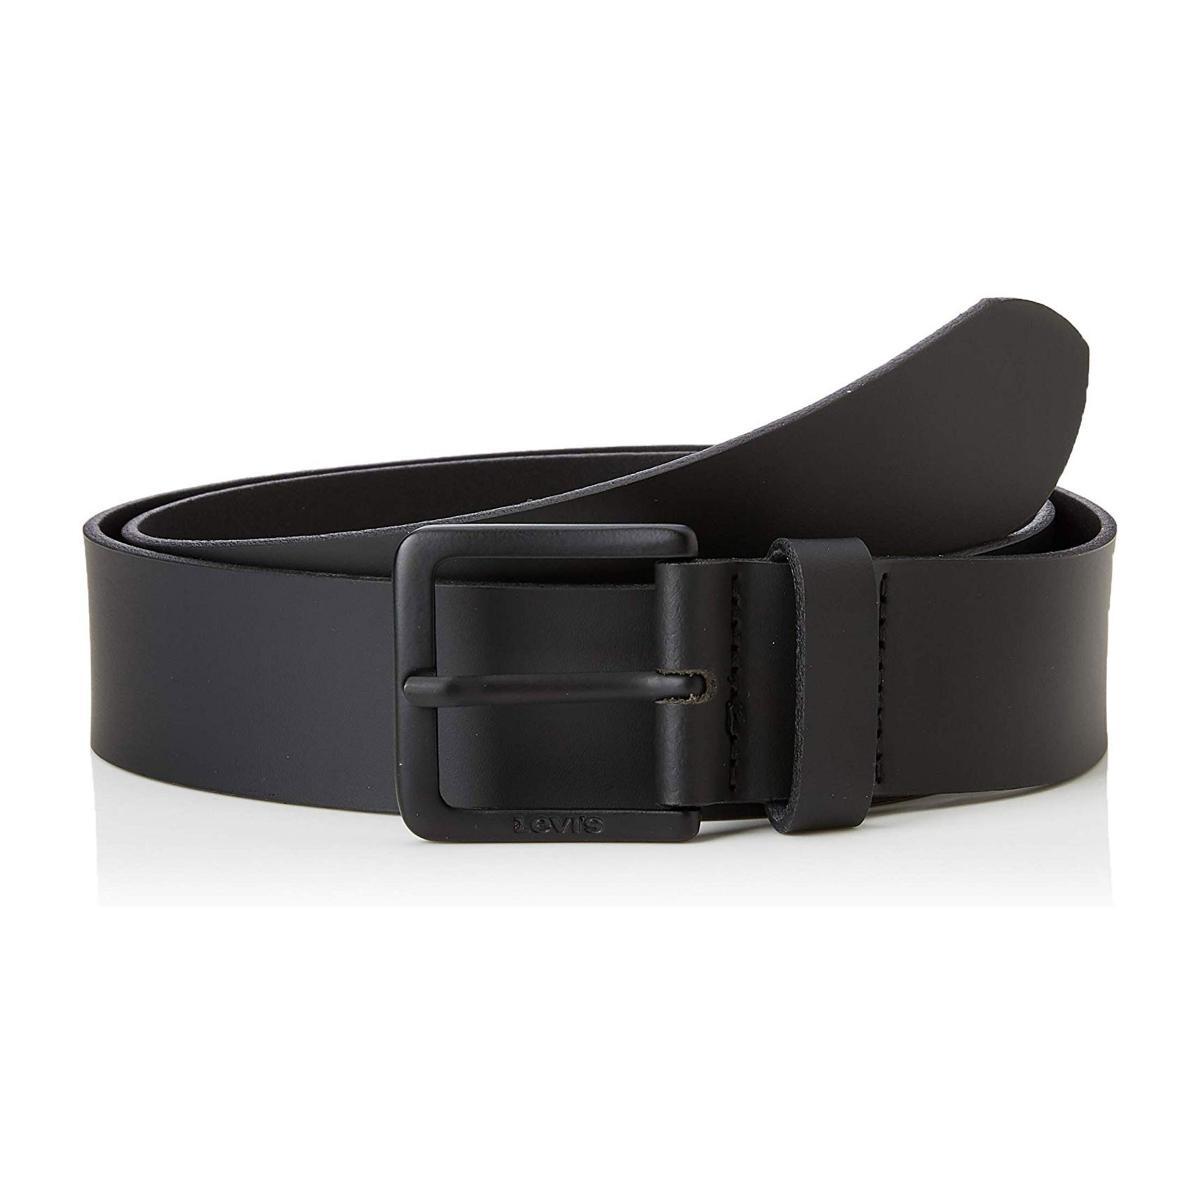 Cintura Levi's in pelle nera da uomo rif. 38016-0408